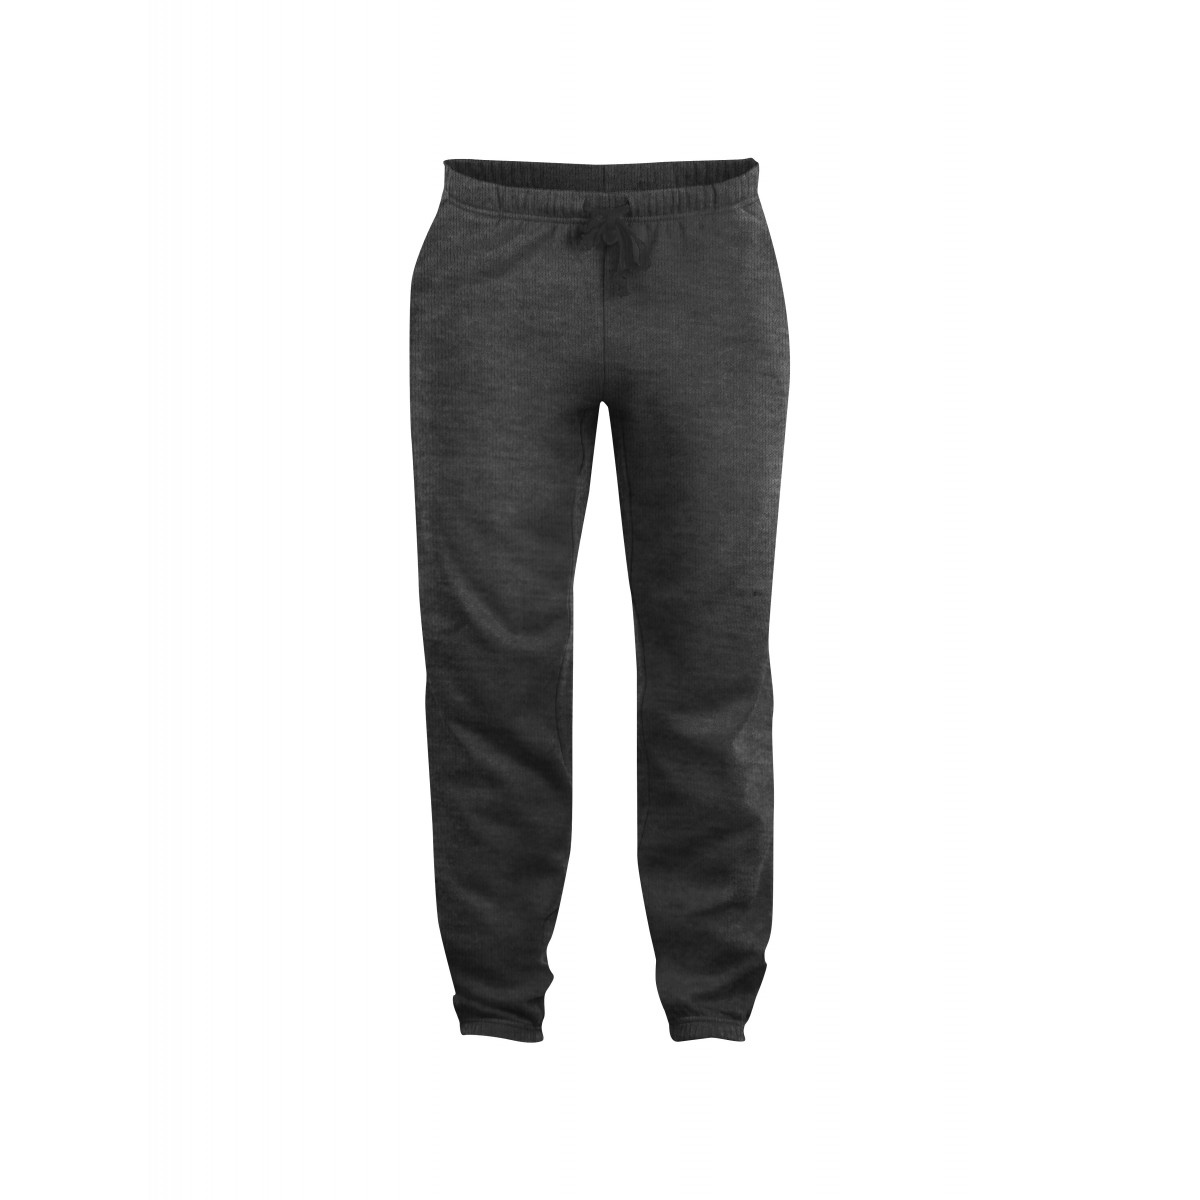 Брюки унисекс 021037 Basic Pants - Темно-серый меланж